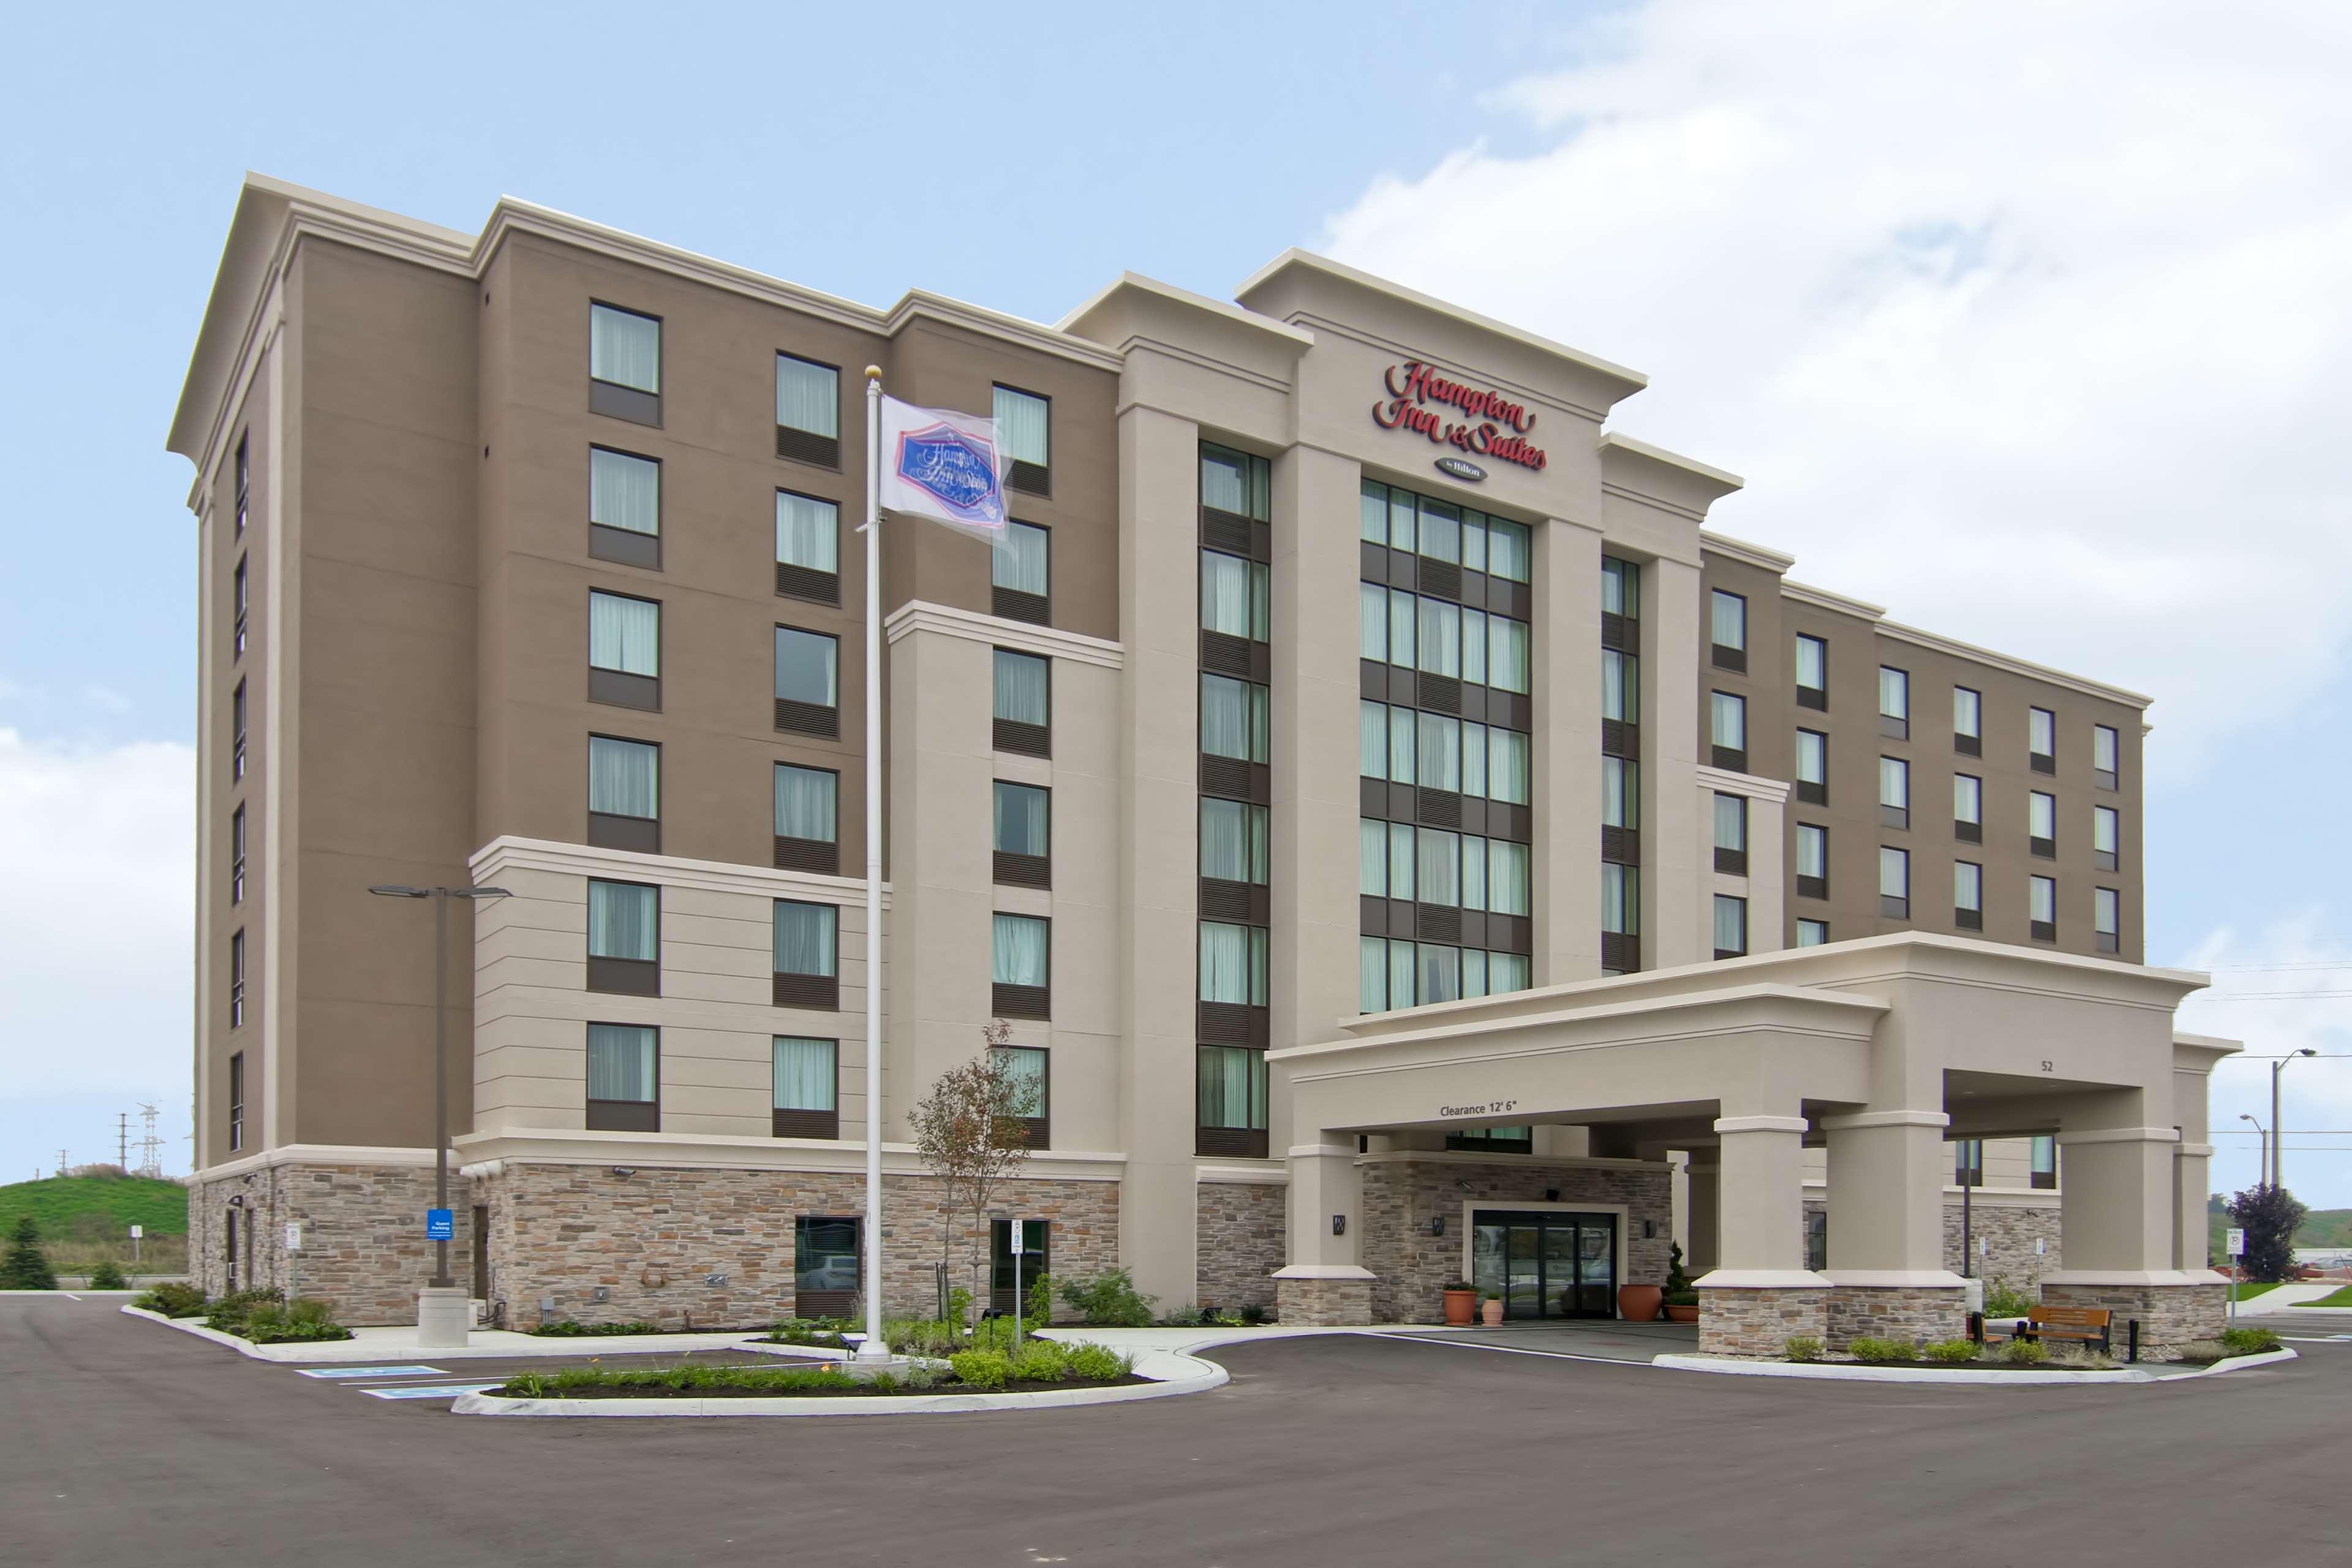 Hampton Inn & Suites by Hilton Toronto Markham - Markham, ON L6G 0A9 - (905)752-5600 | ShowMeLocal.com